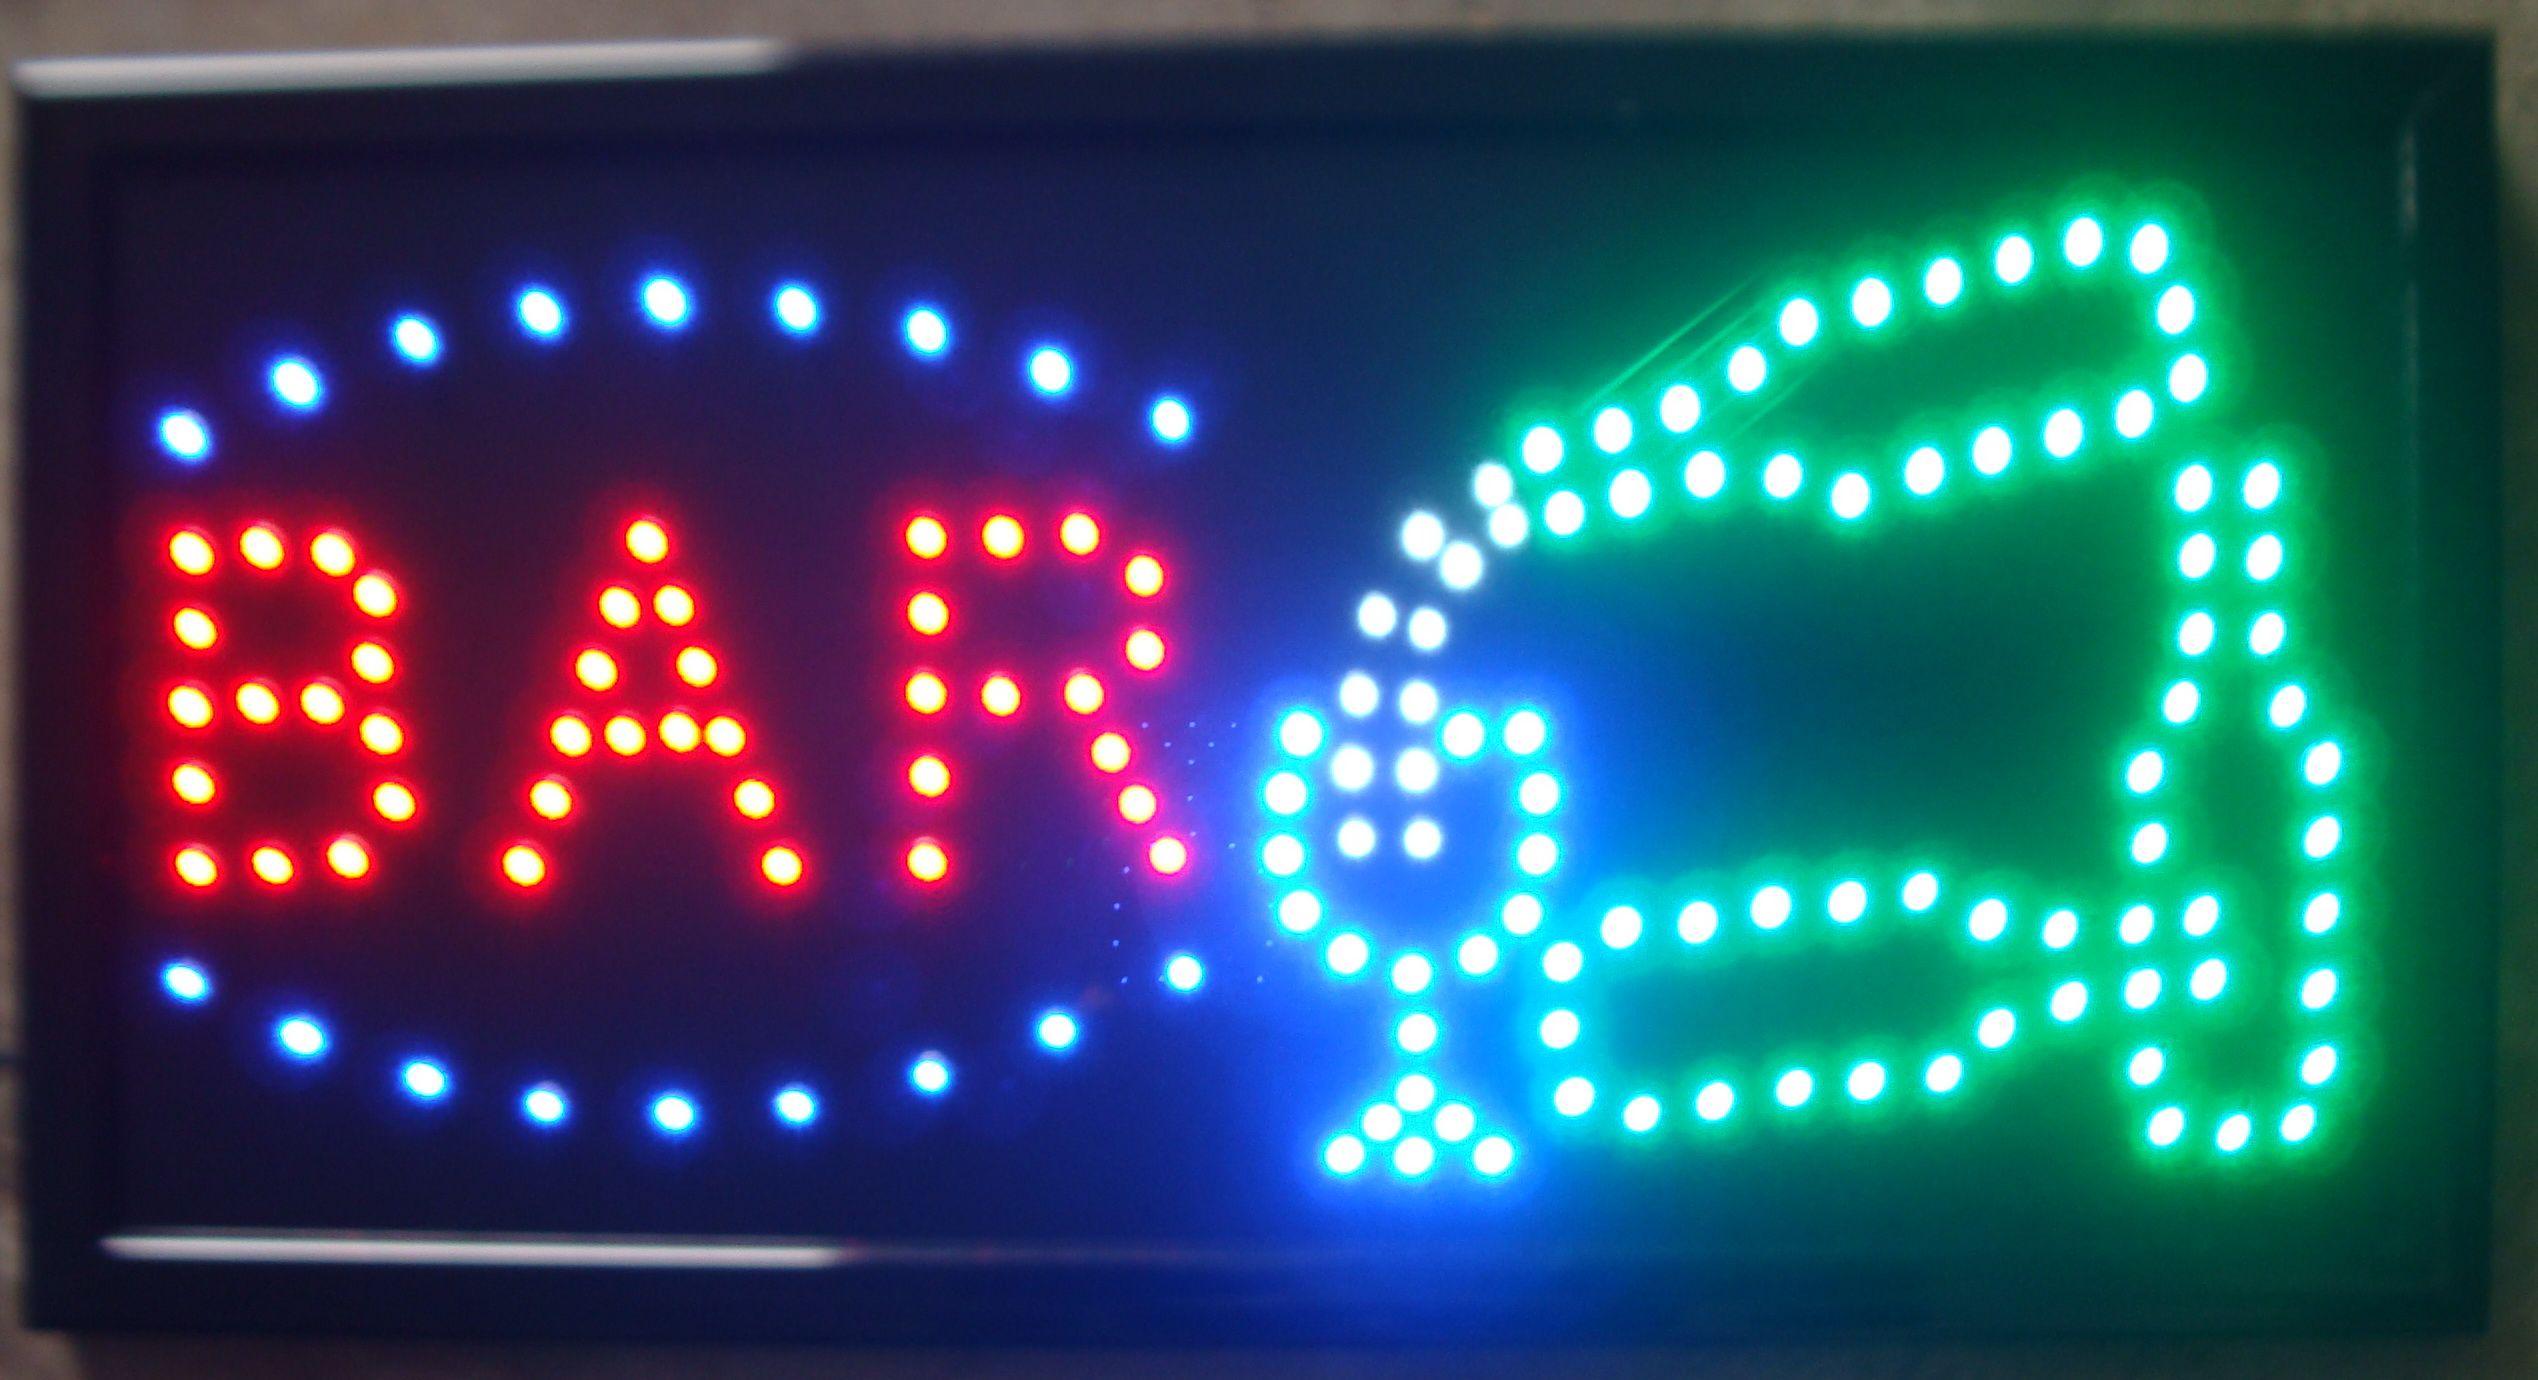 2019 2016 Open Bar Led Neon Business Motion Light Sign. On